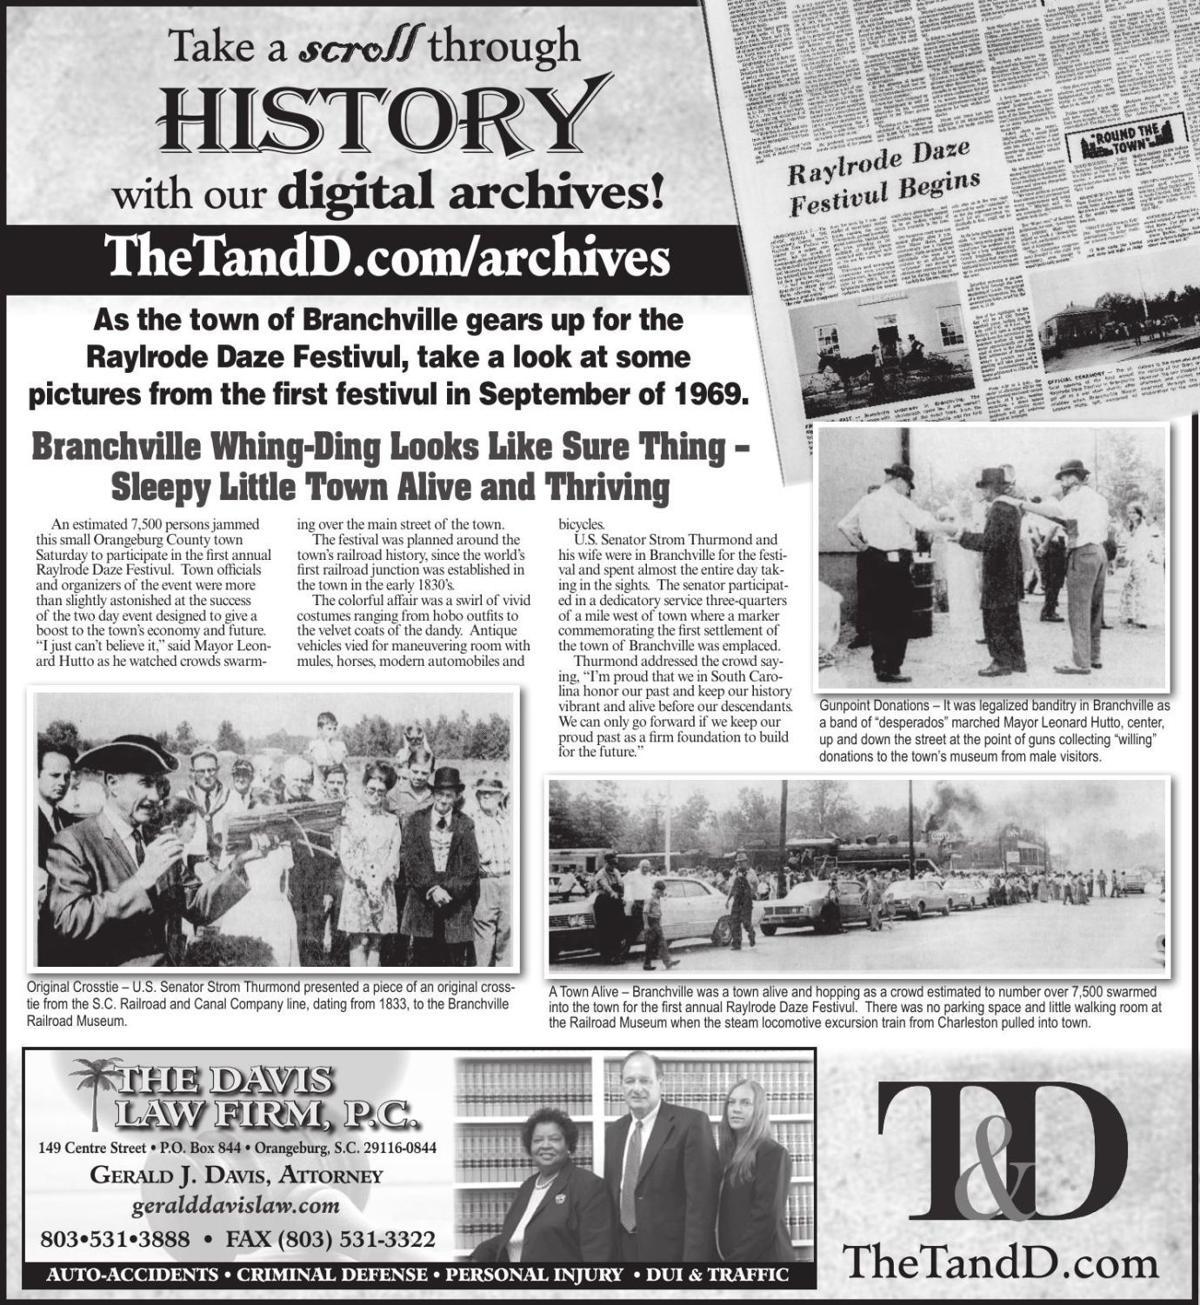 TheTandD.com/archives Sept. 15, 2019